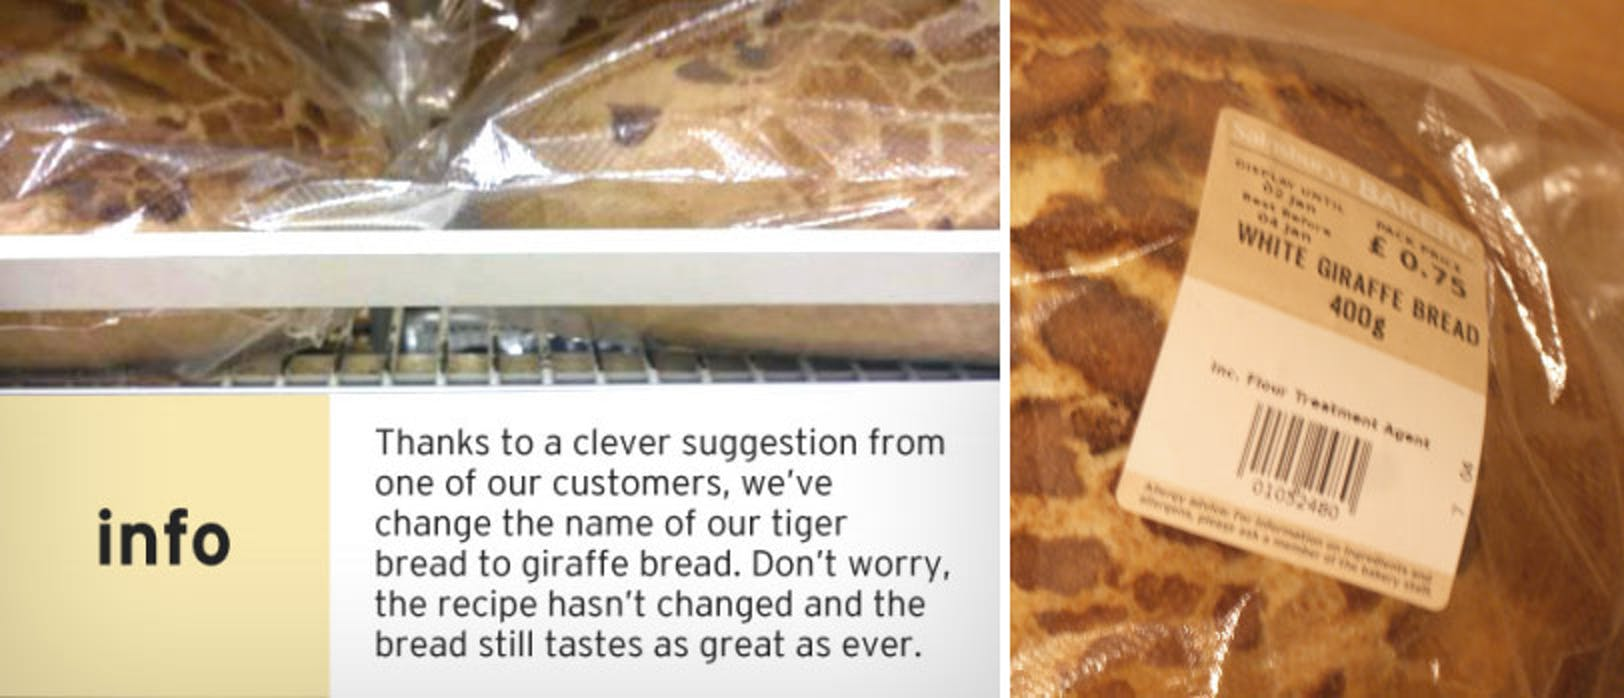 Sainsbury-Giraffe-bread-example